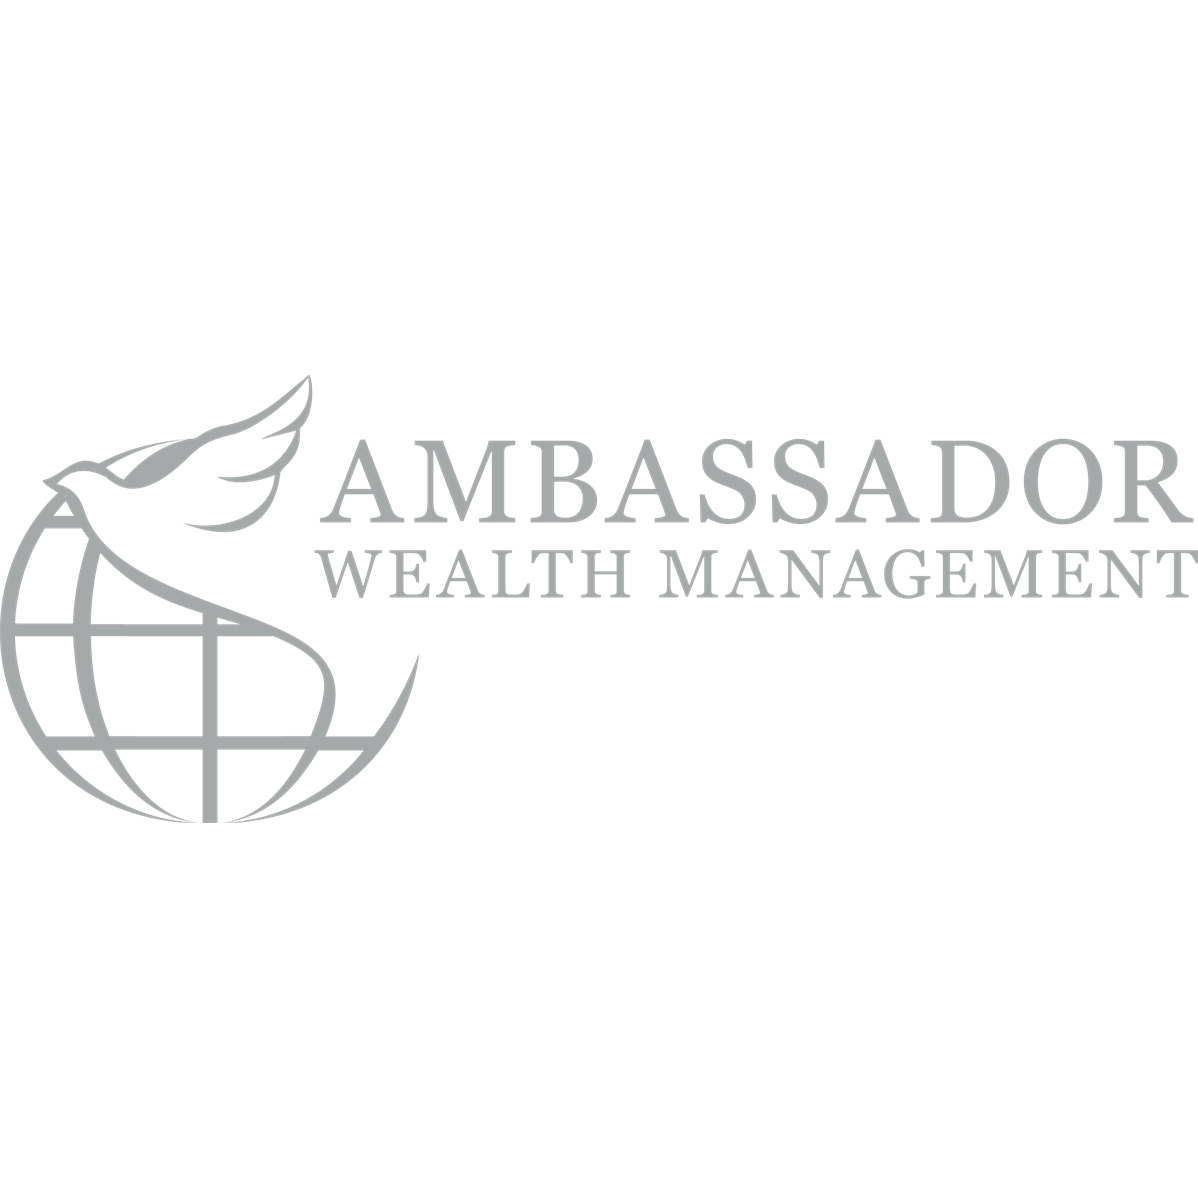 Ambassador Wealth Management | Financial Advisor in Warrenville,Illinois